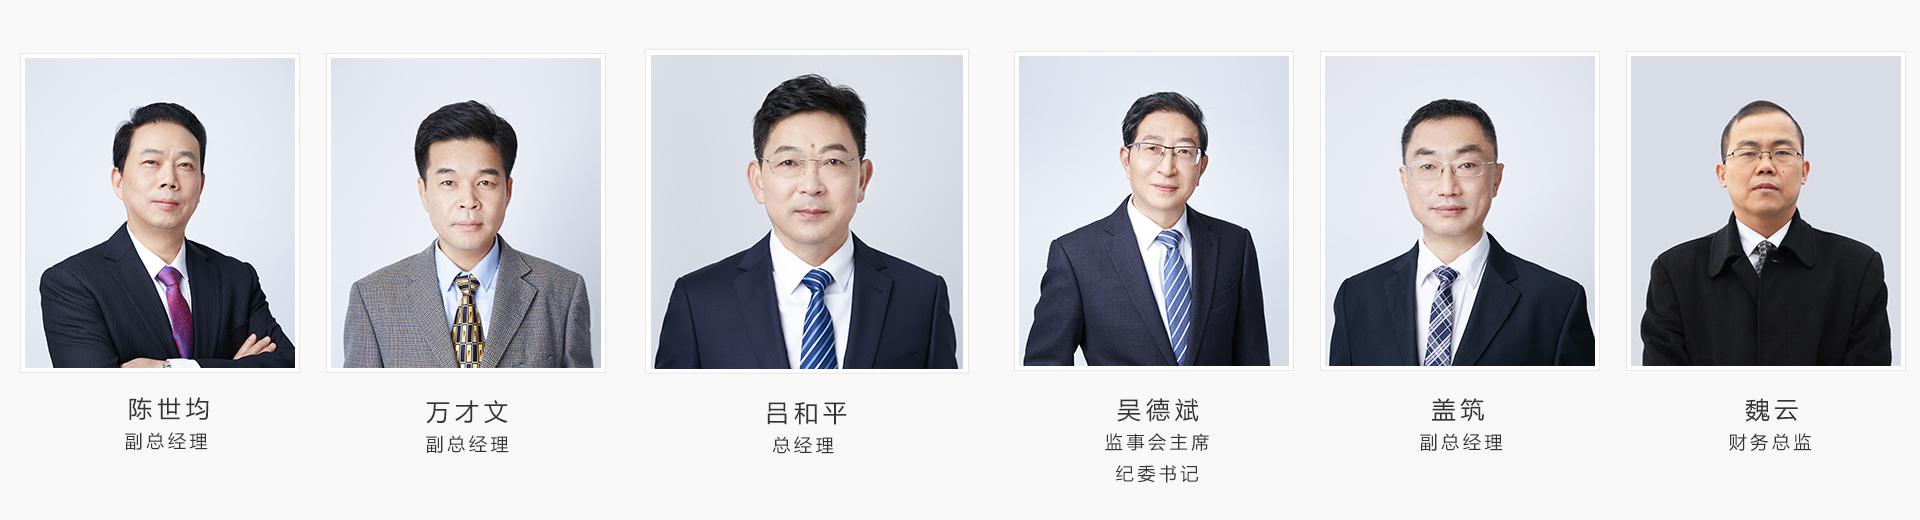 gaoguan5.jpg